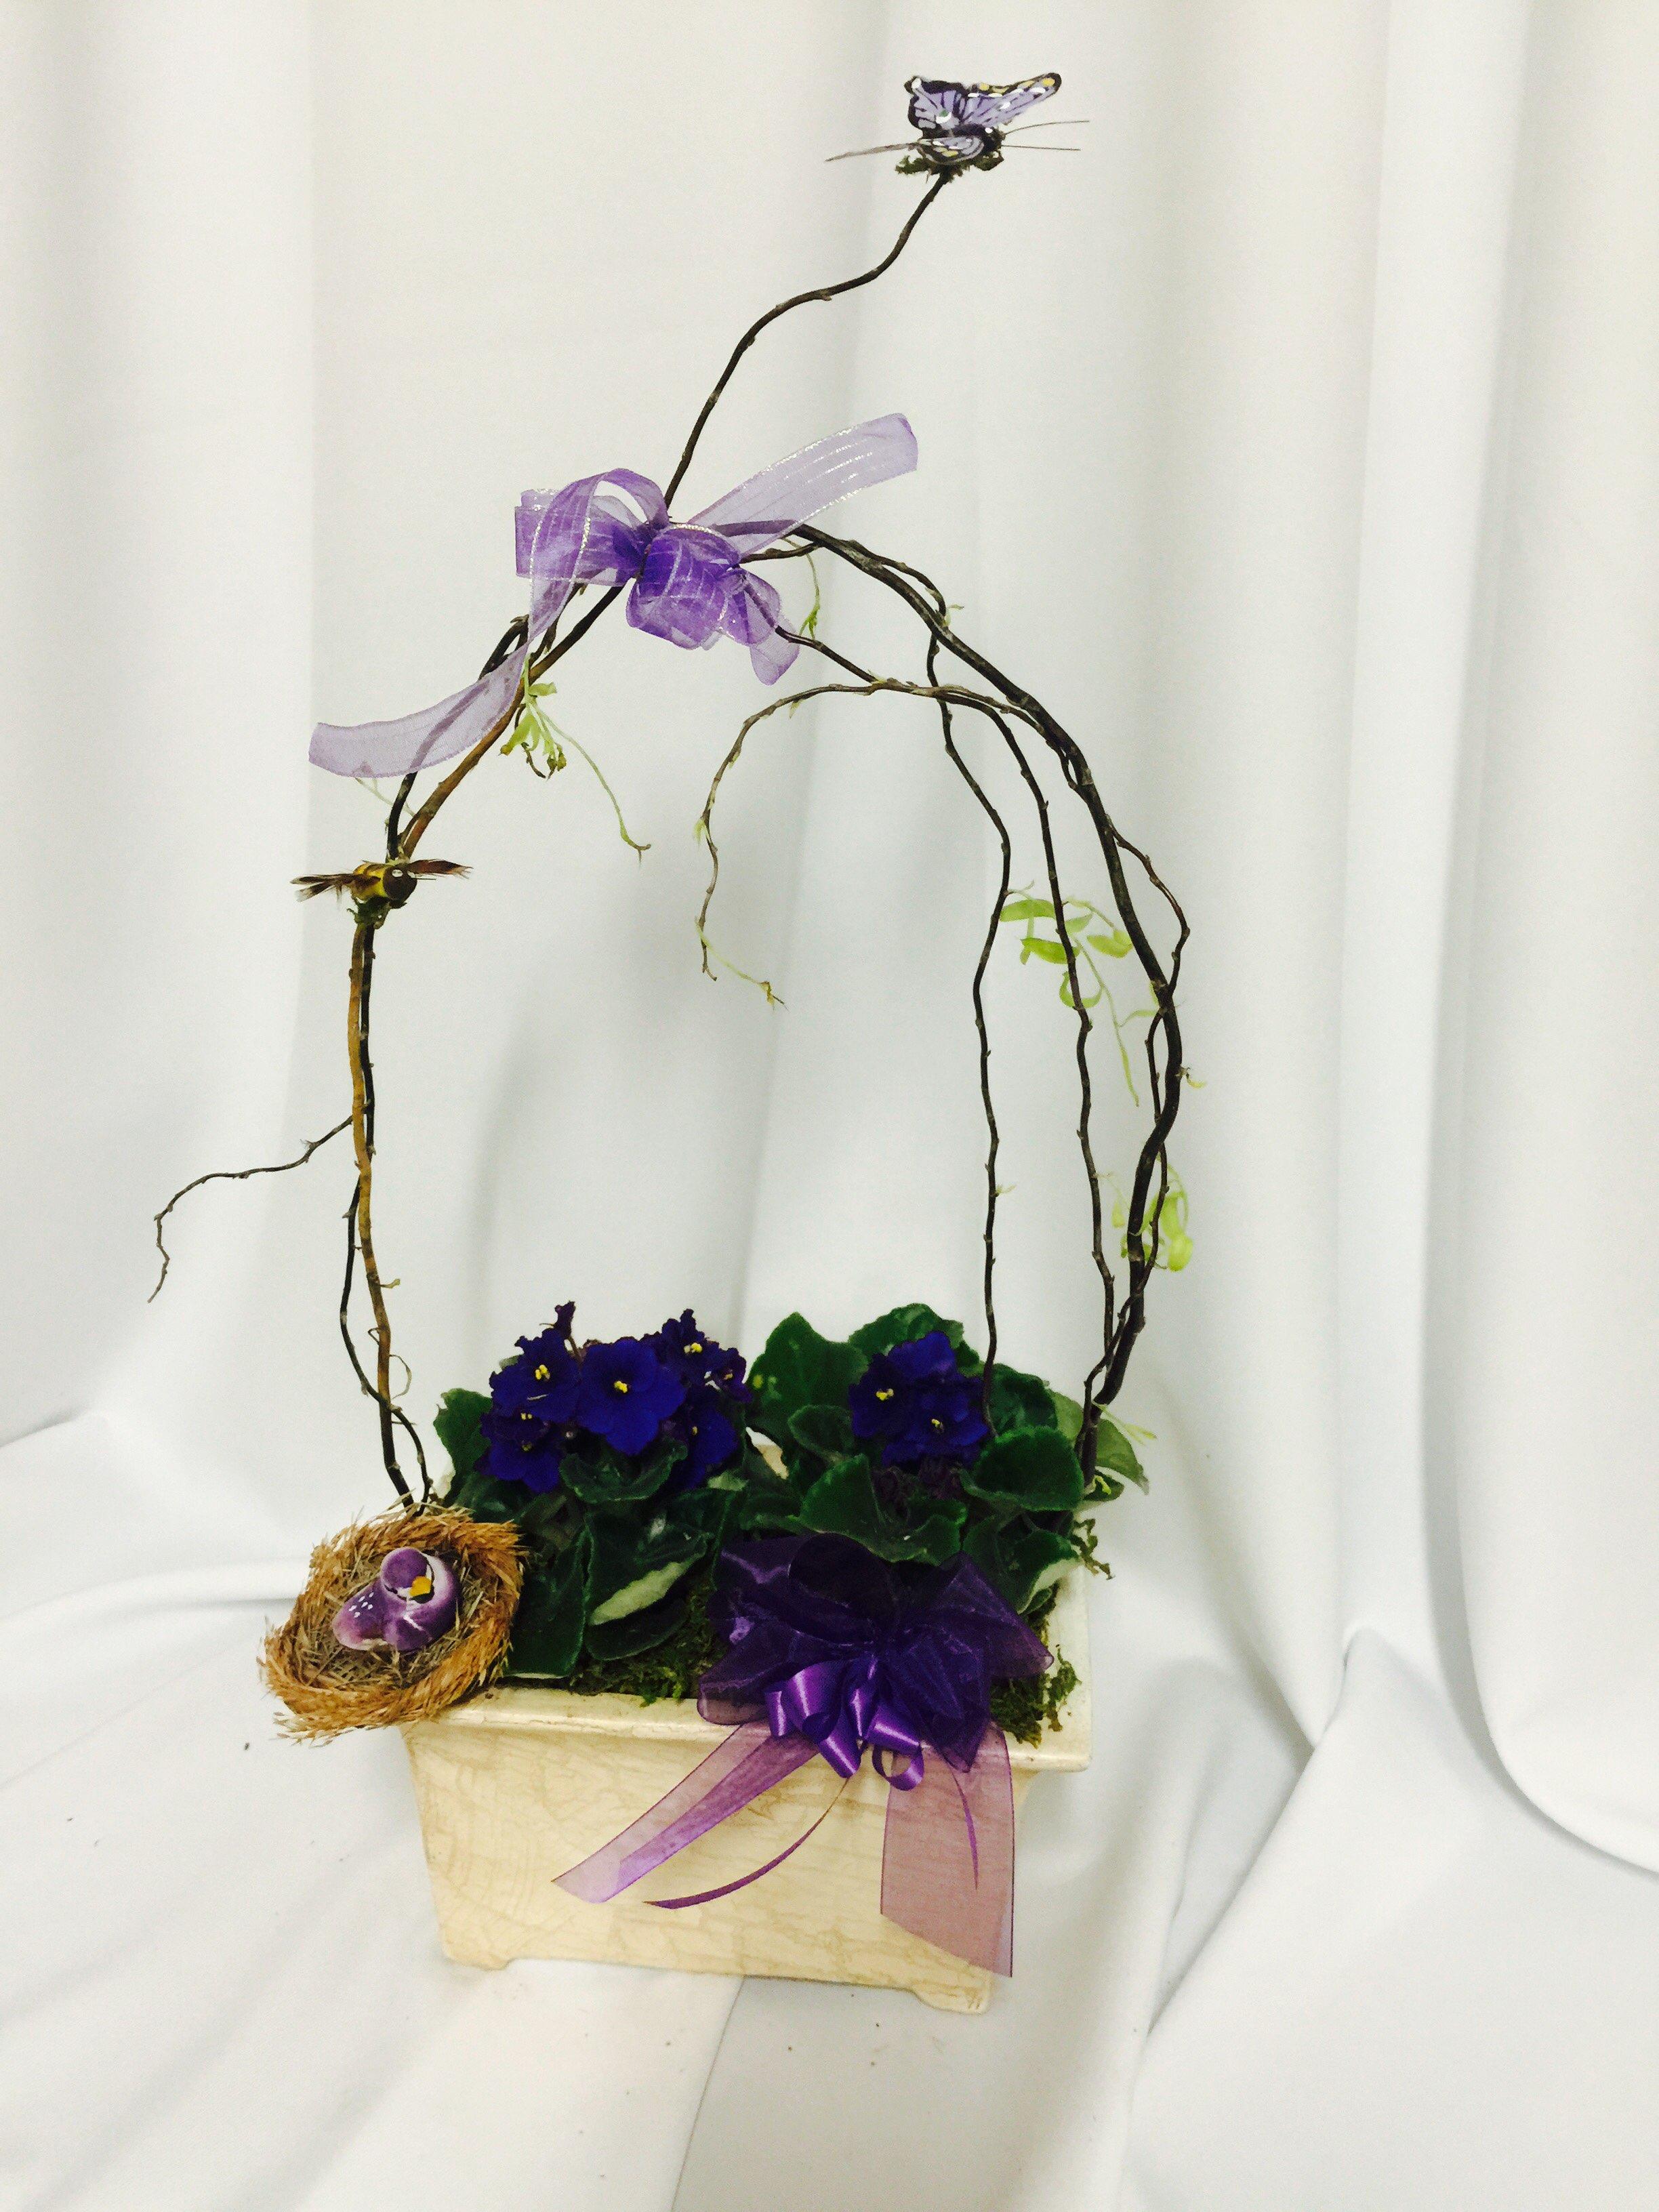 violets in abundance